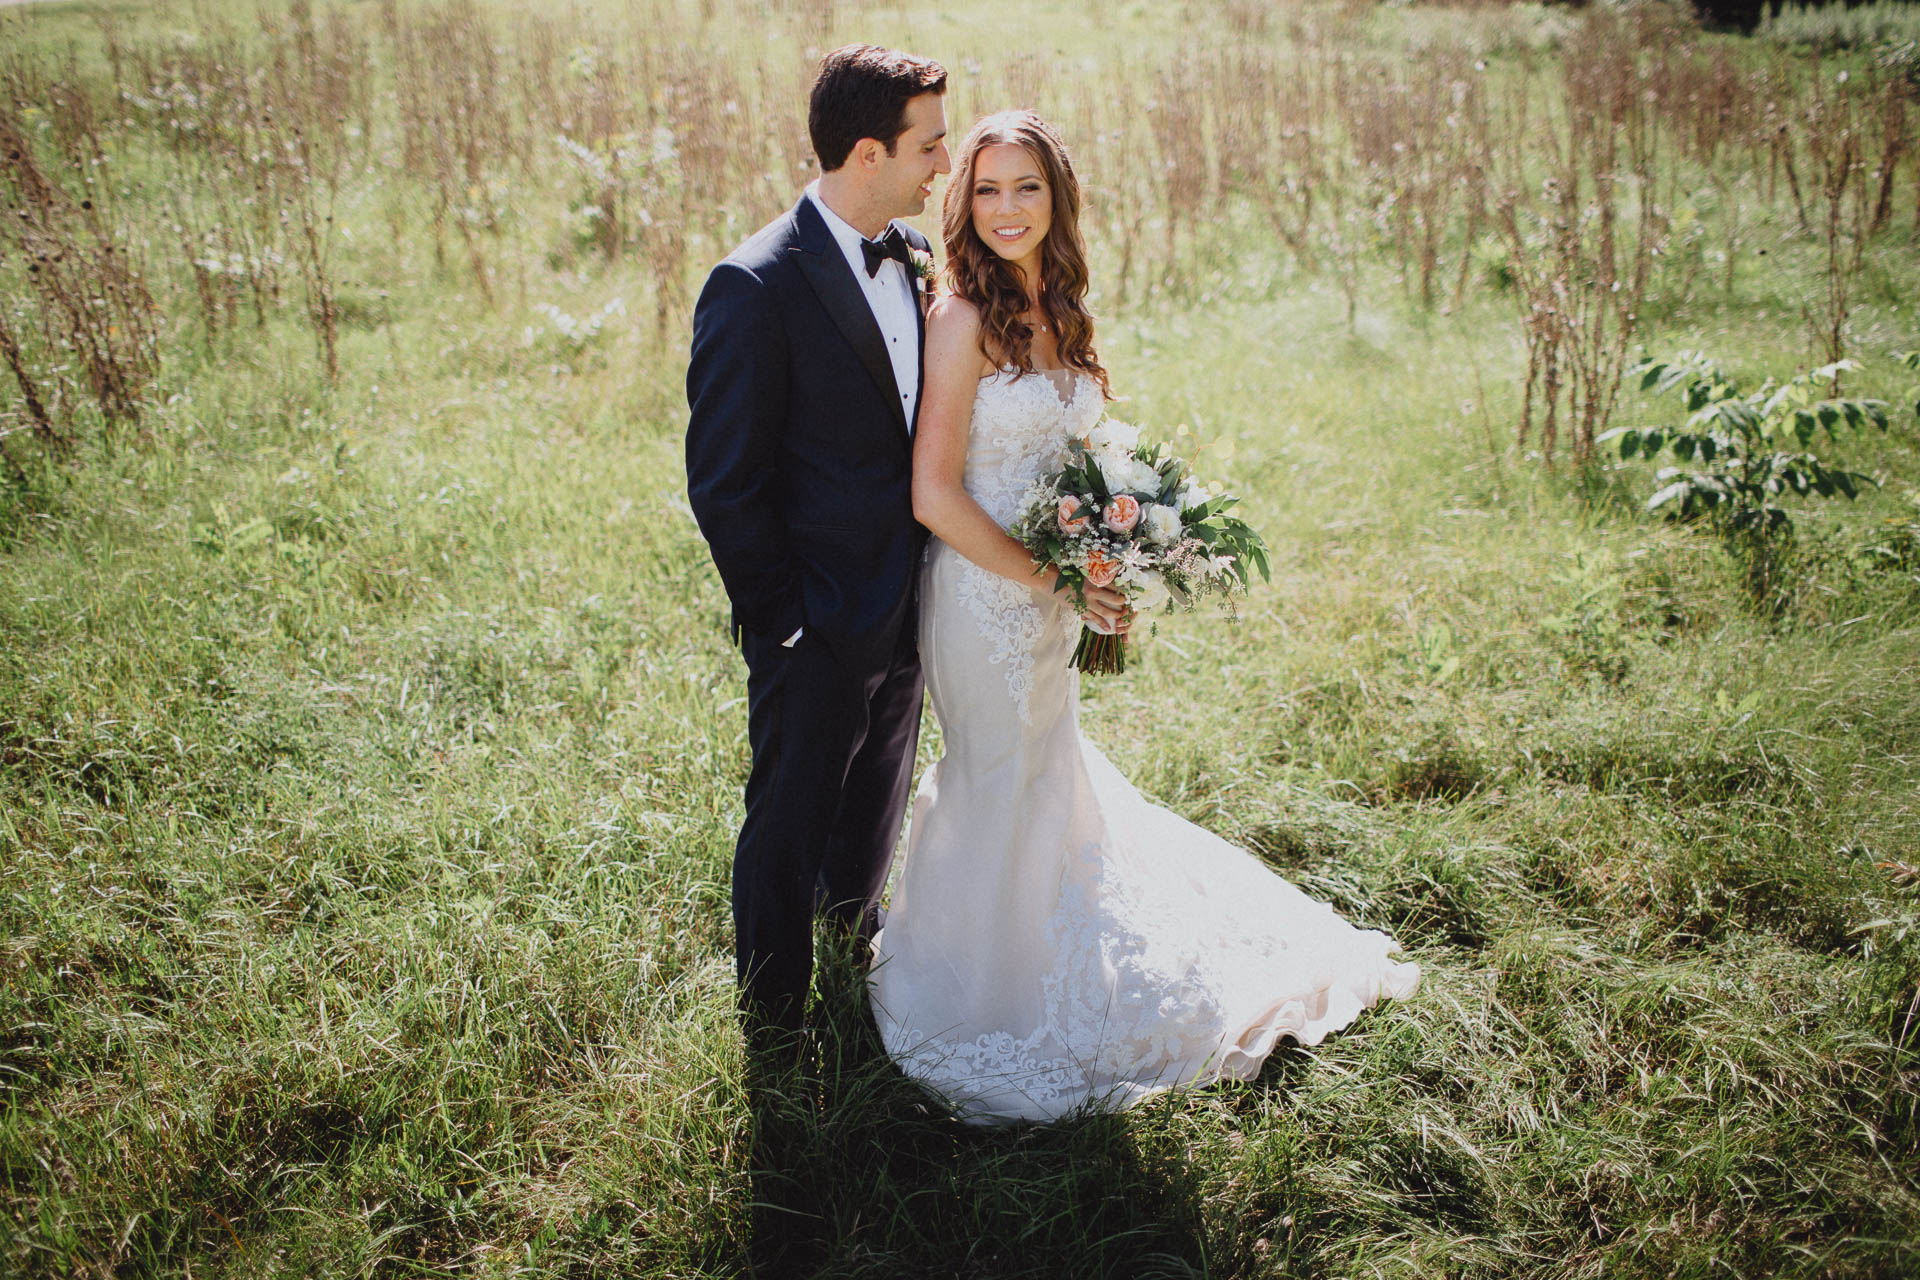 Keri-Joseph-Top-of-the-Market-Wedding-121@2x.jpg